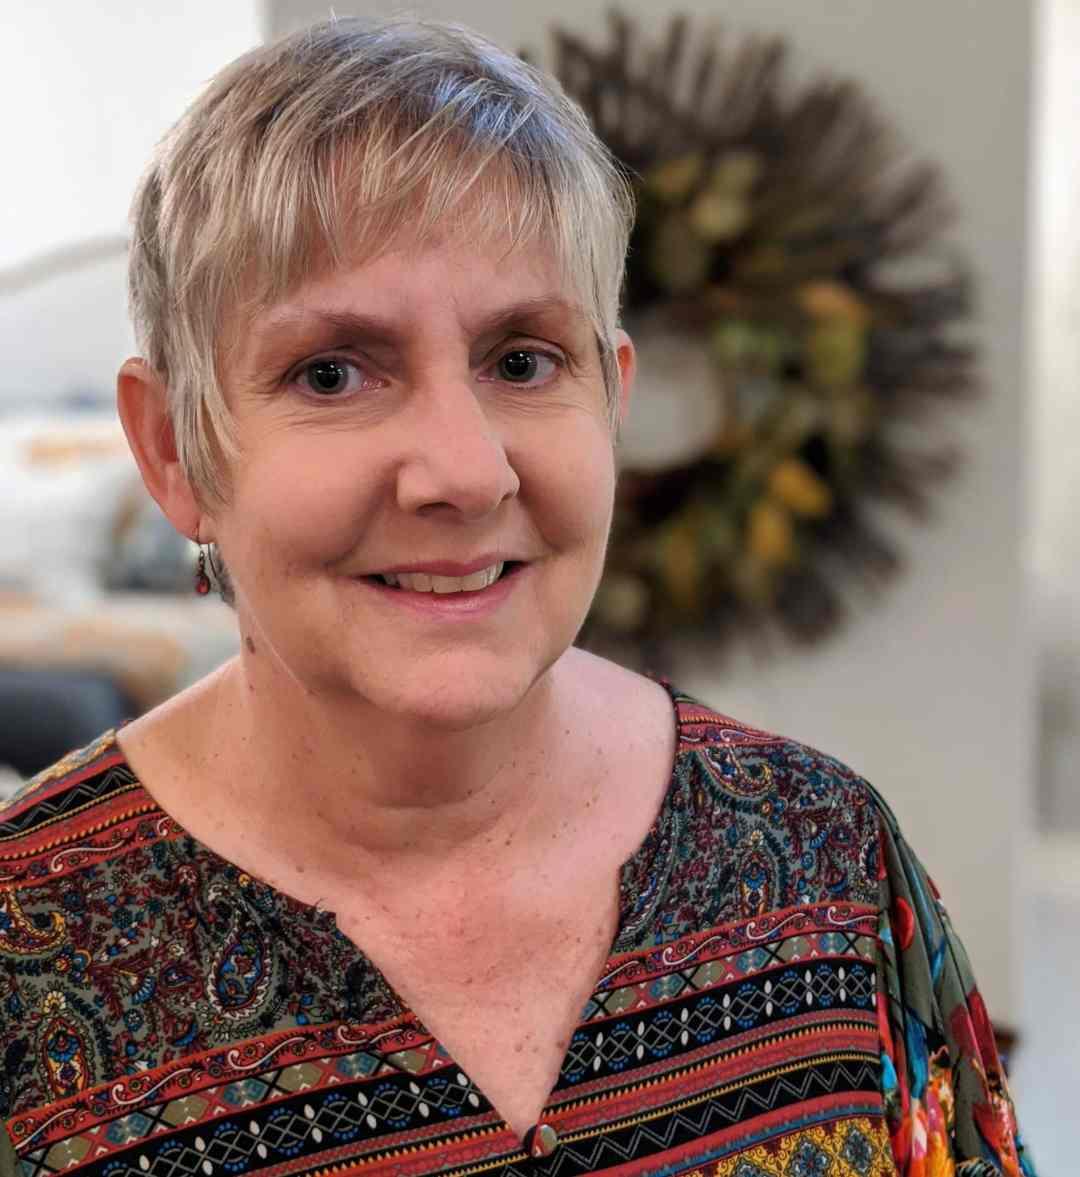 Pam Holman